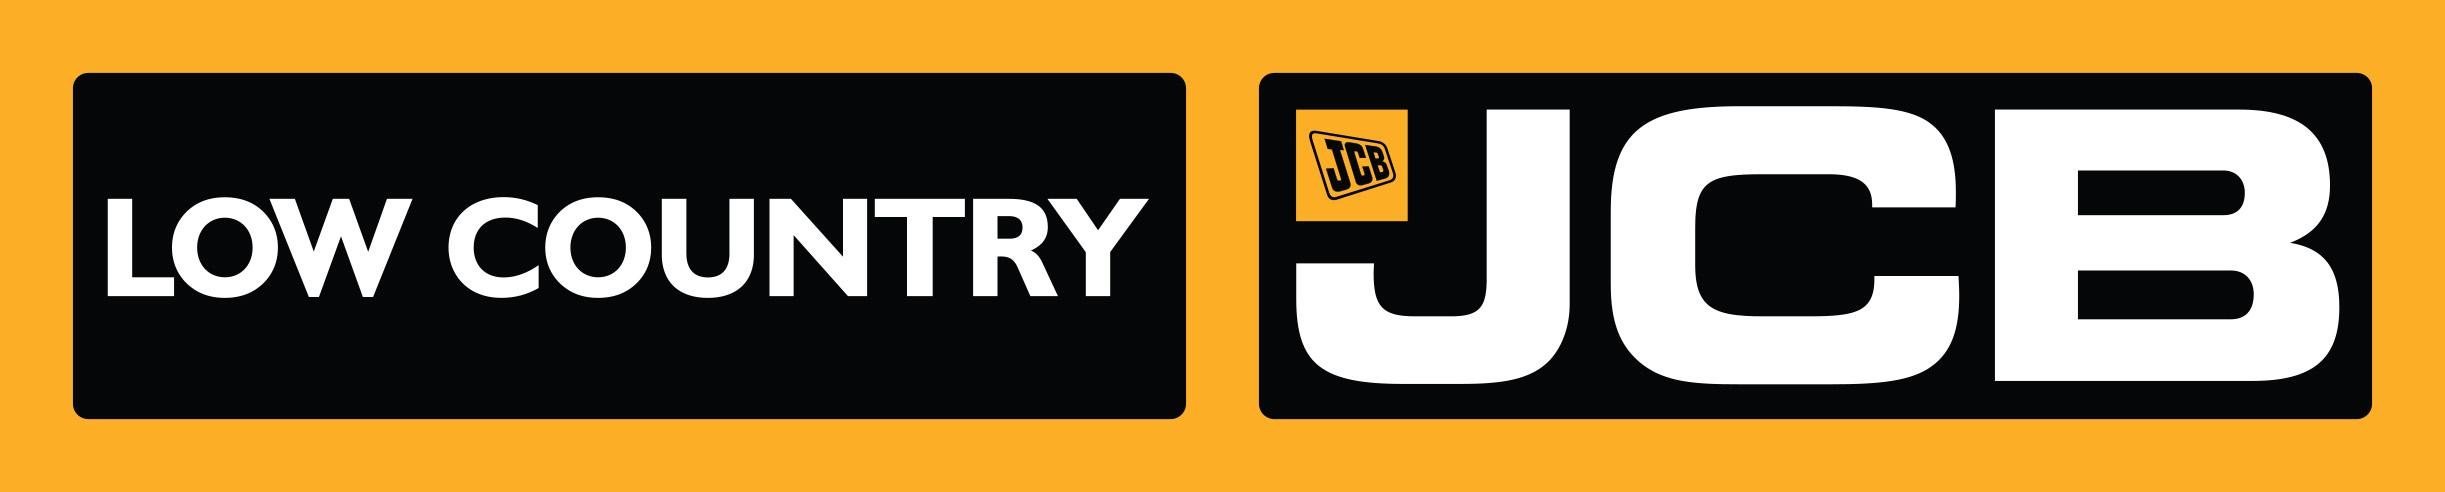 Low Country JCB company logo